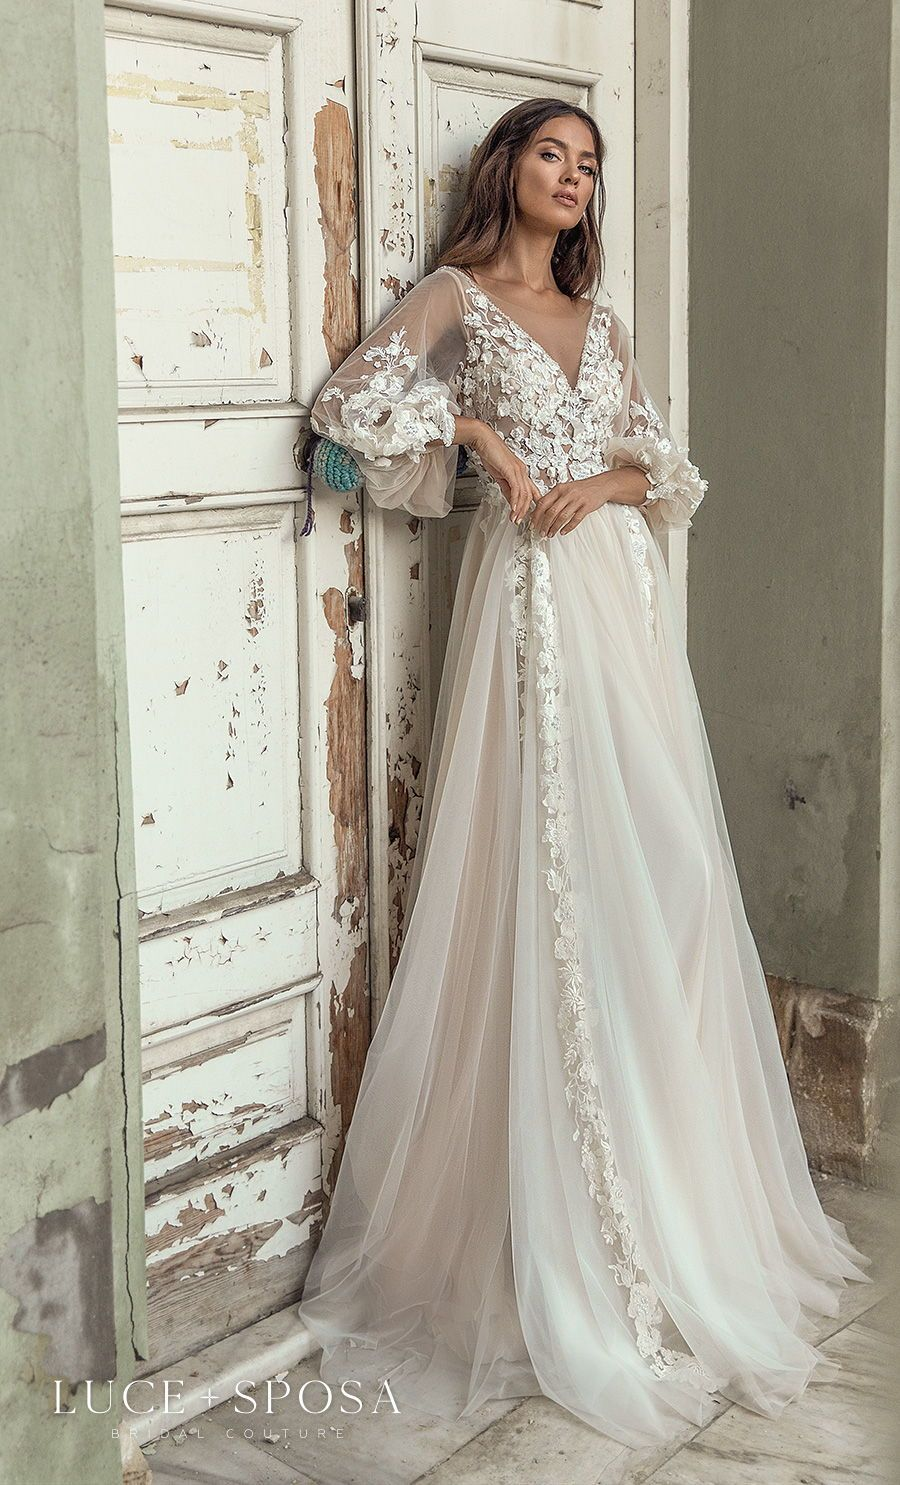 Luce Sposa Spring Summer 2021 Wedding Dresses Istanbul Paris Bridal Collections Wedding Inspirasi Wedding Dresses Summer Wedding Dress Wedding Dress Long Sleeve [ 1485 x 900 Pixel ]